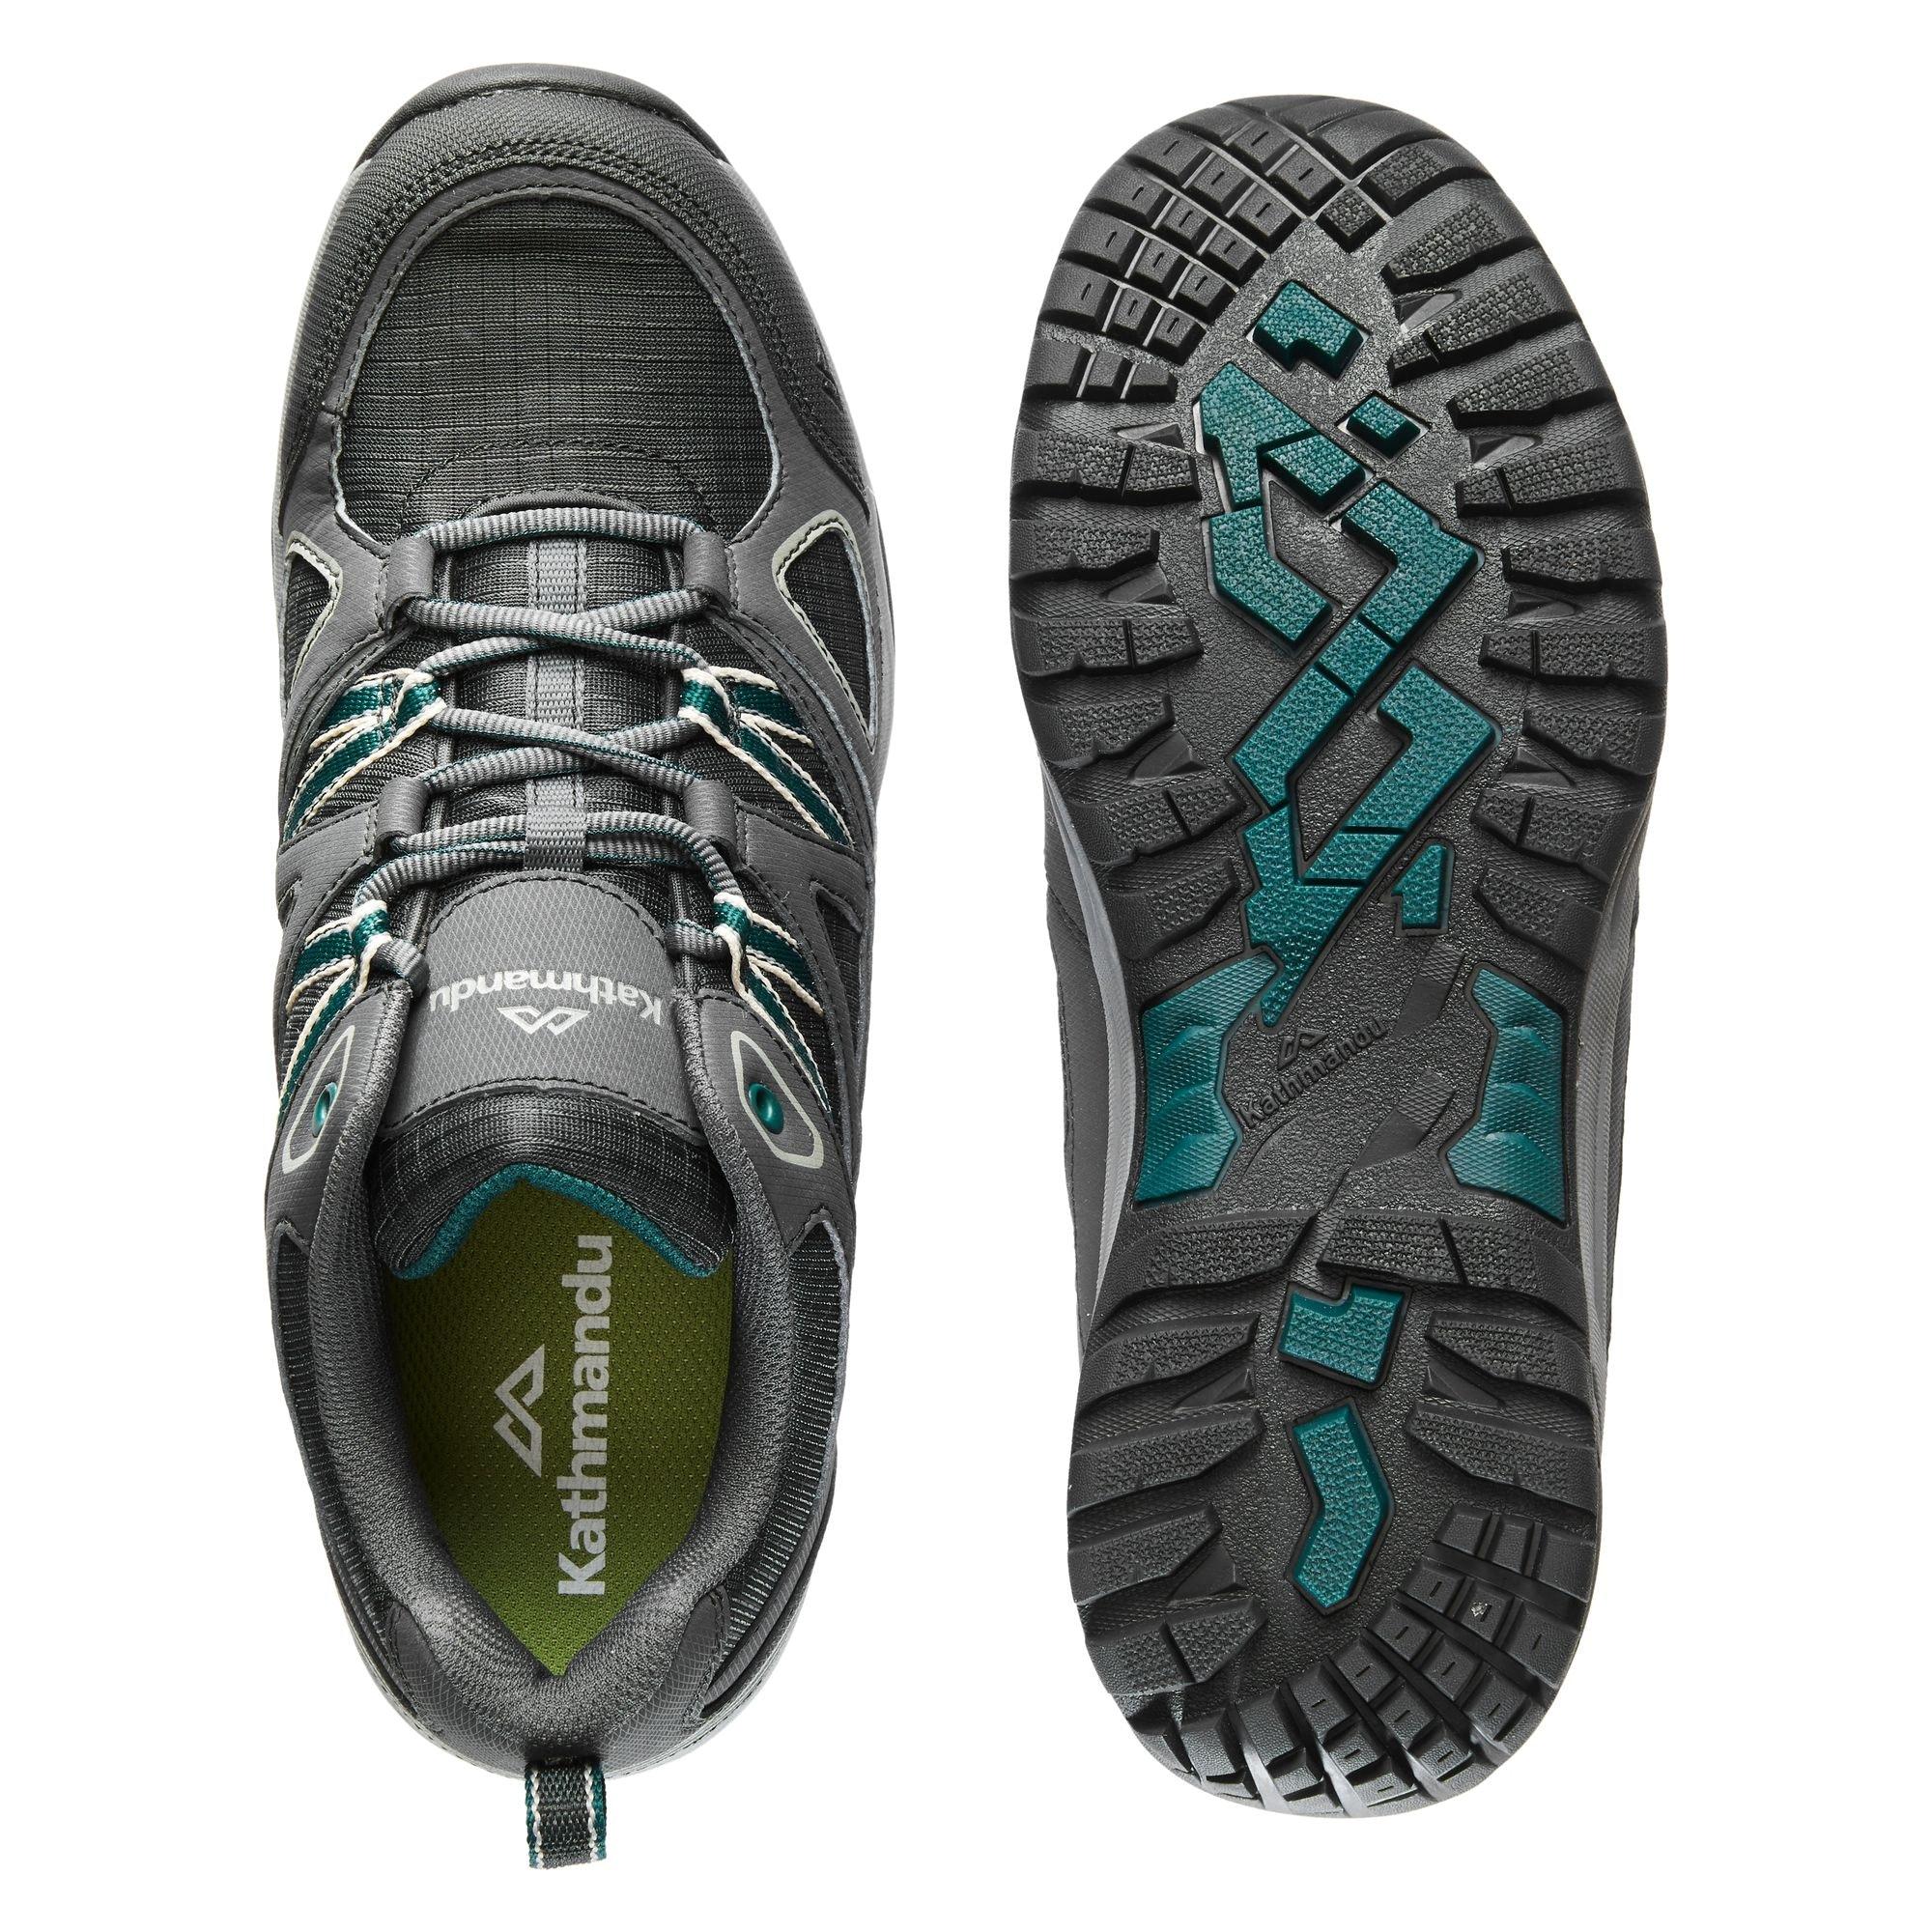 NEW-Kathmandu-Serpentine-II-Men-039-s-Lighweight-Durable-Hiking-Walking-Shoes thumbnail 6